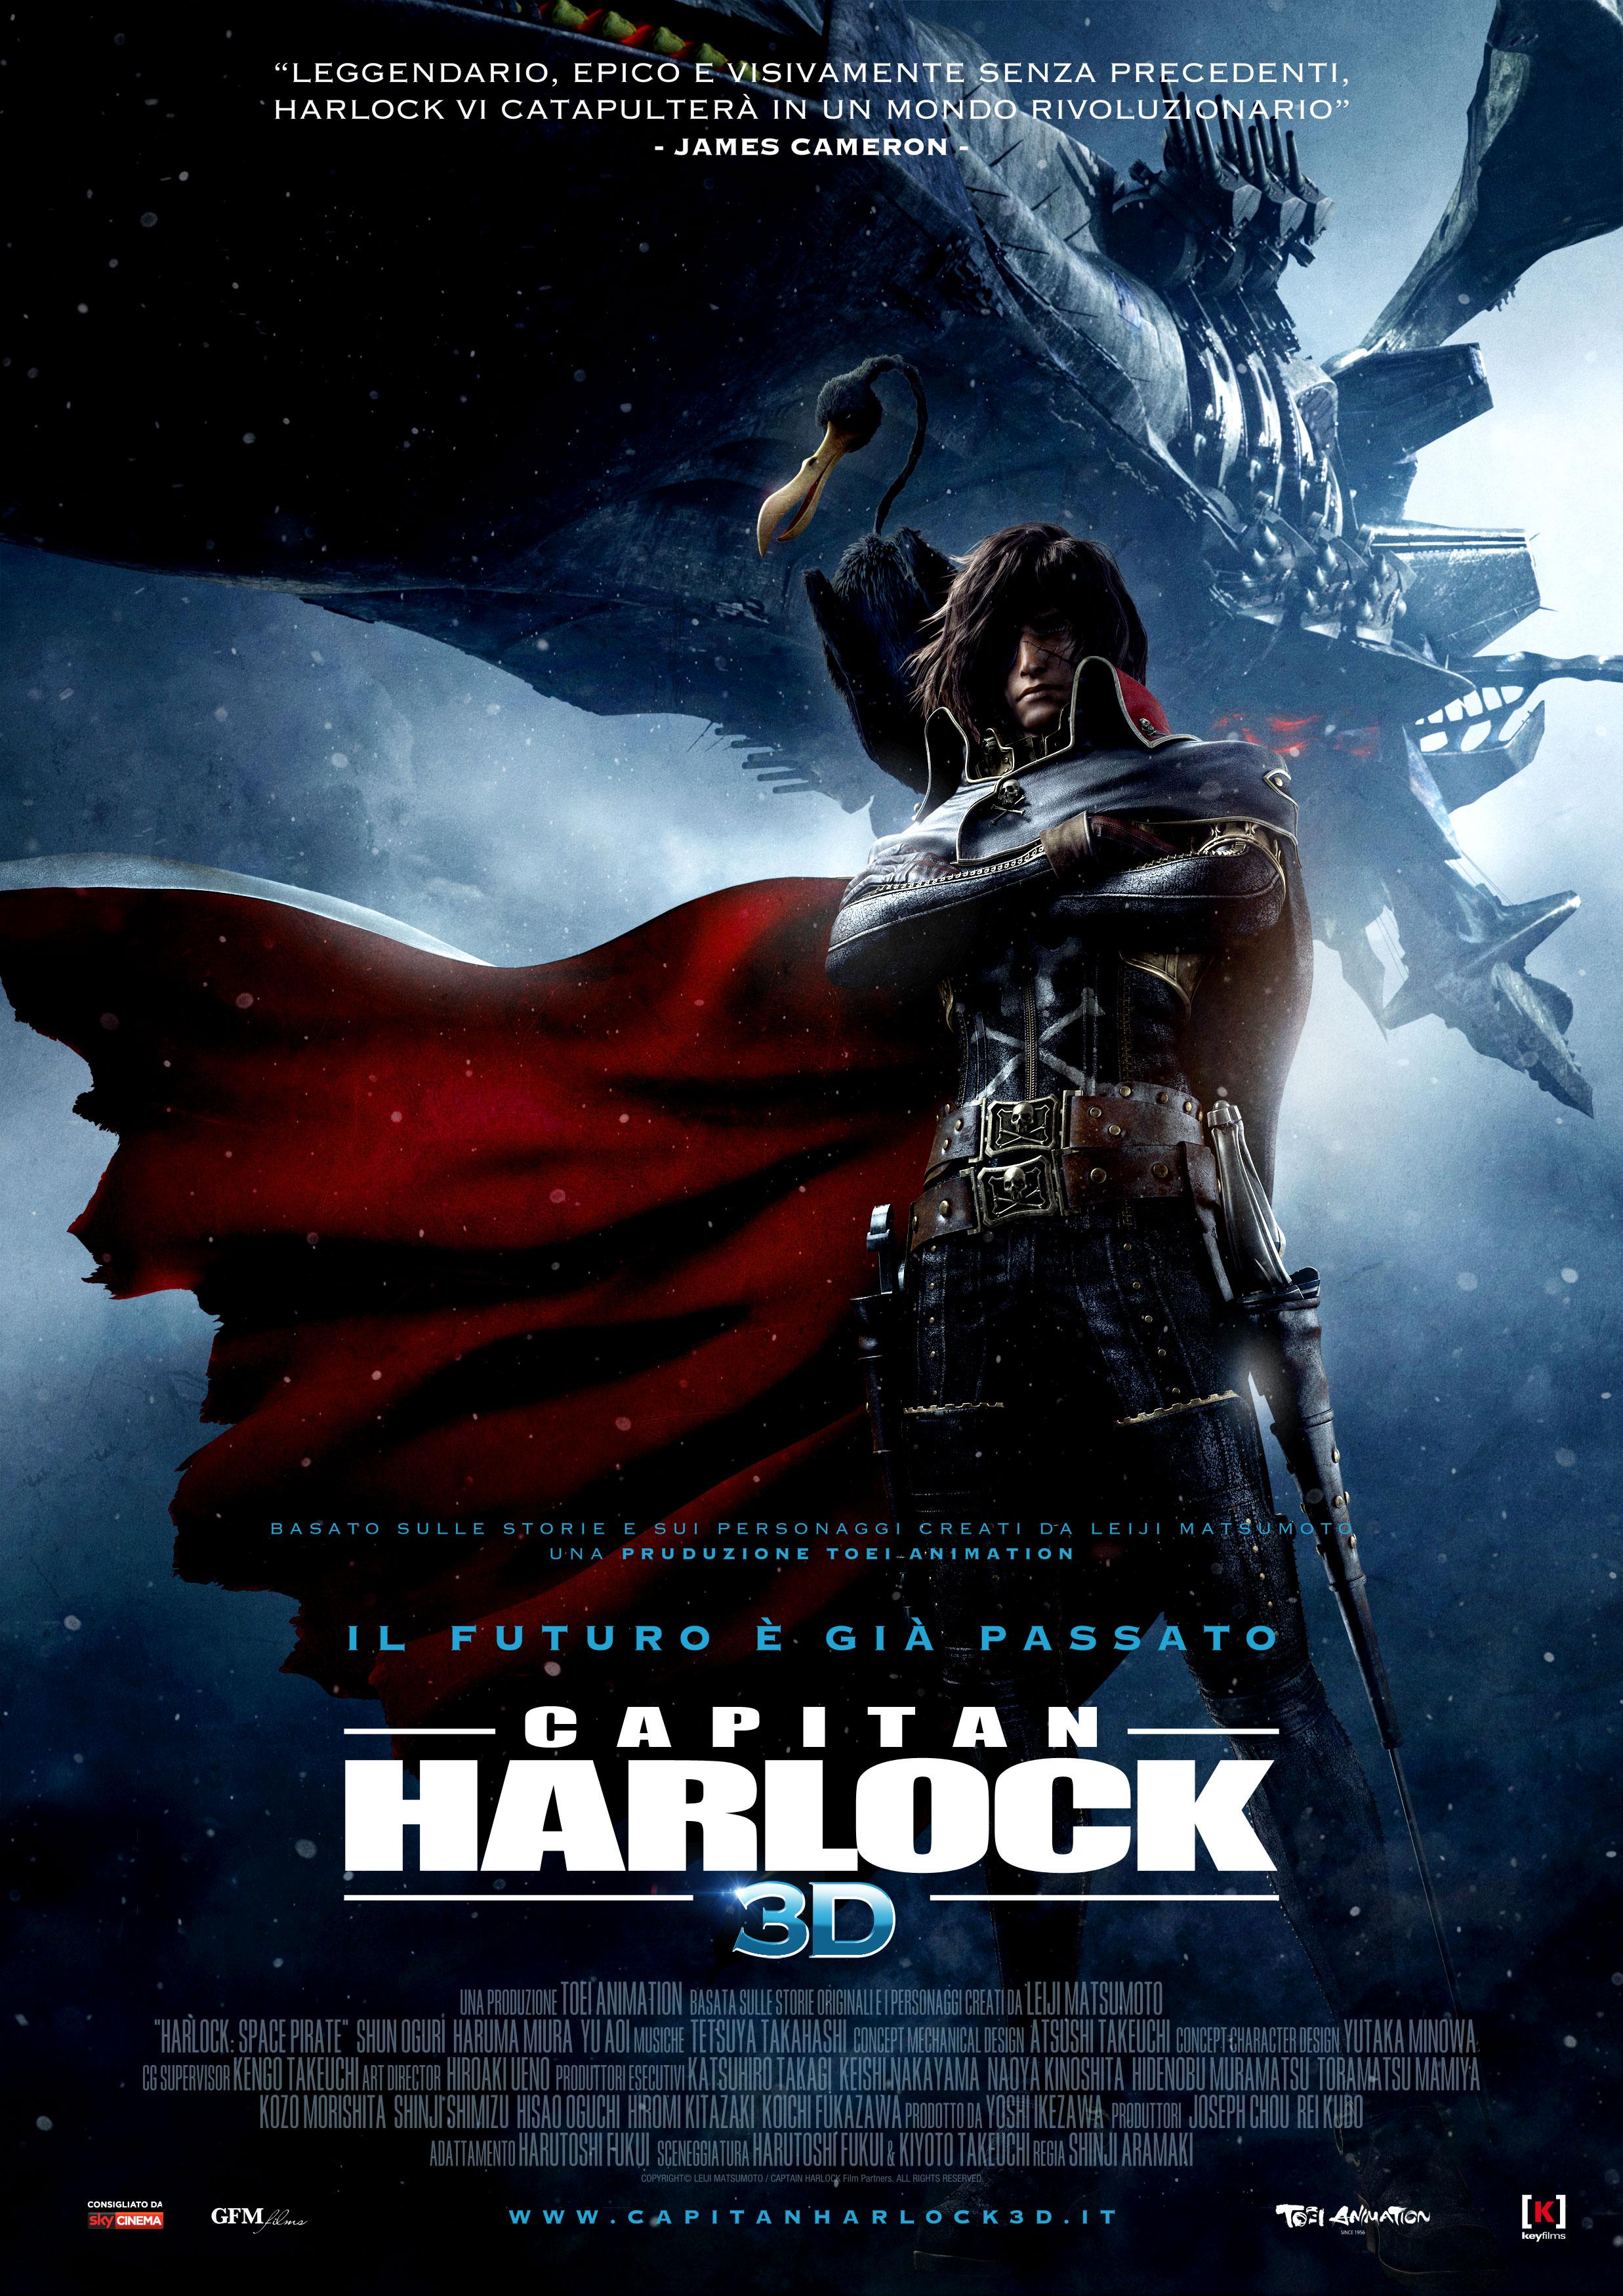 capitan harlock 3d locandina